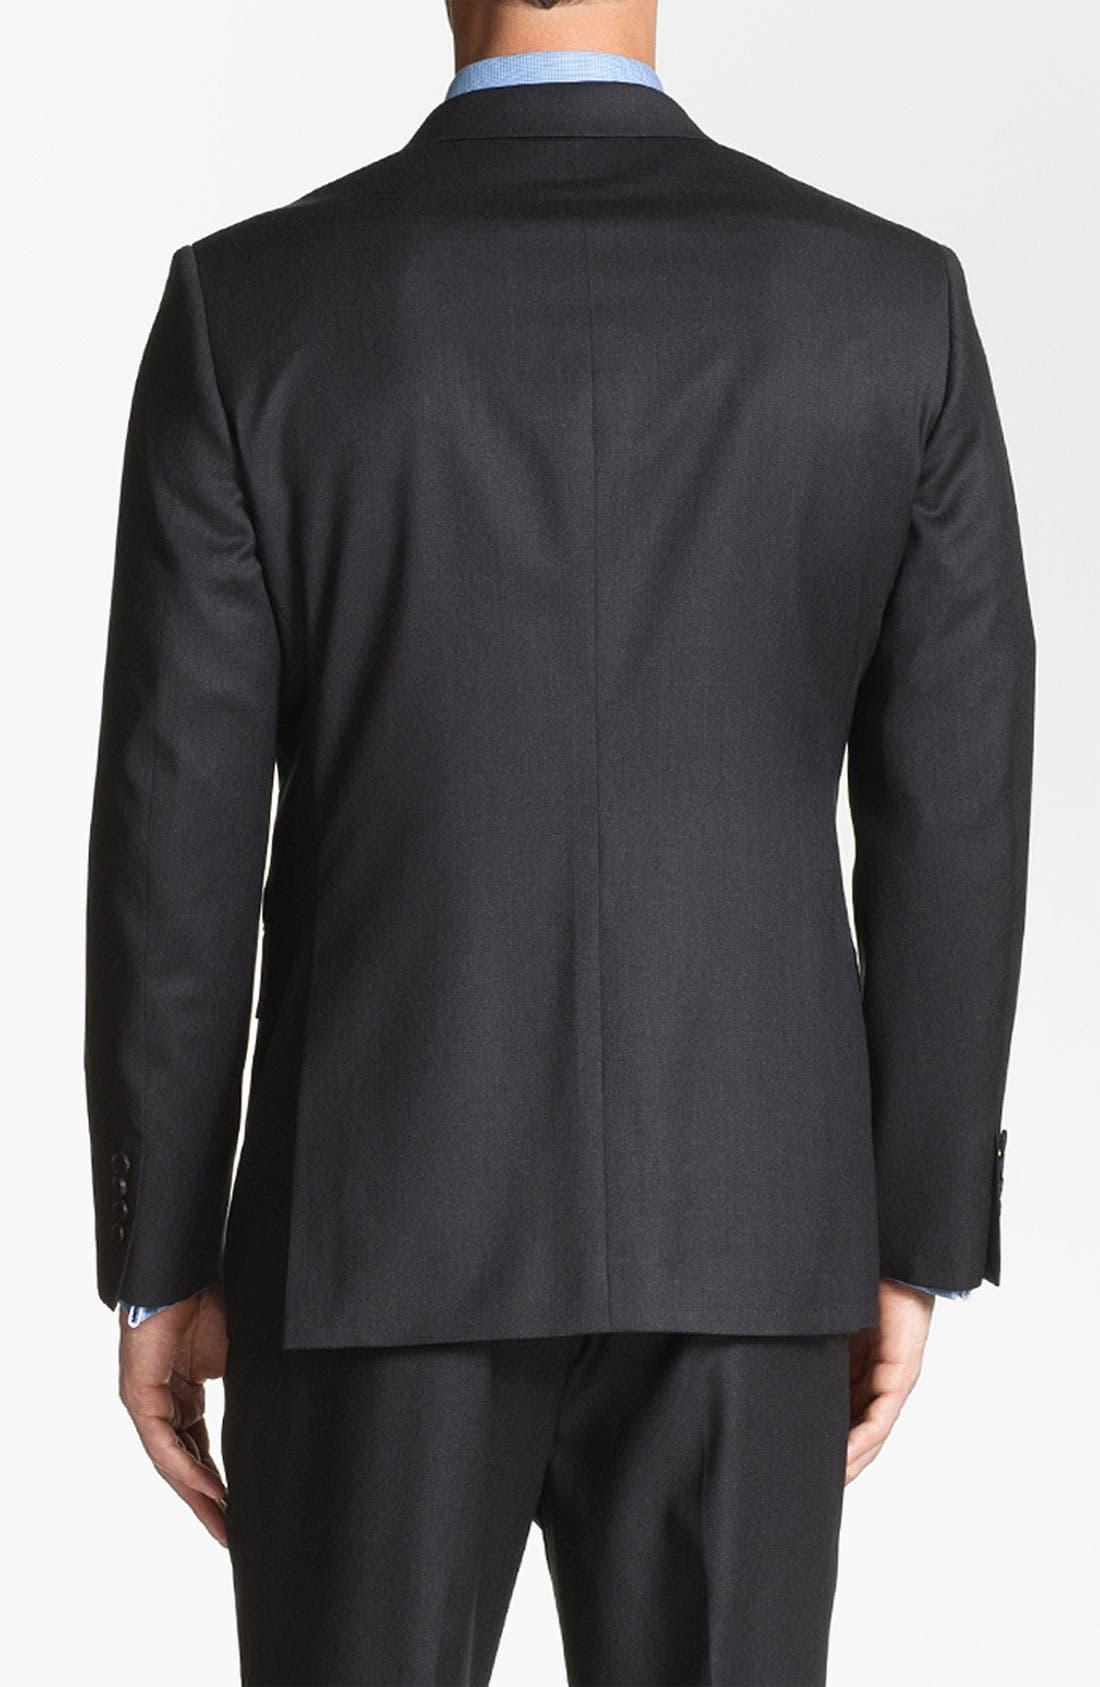 Alternate Image 4  - John W. Nordstrom 'Travel' Classic Fit Wool Suit